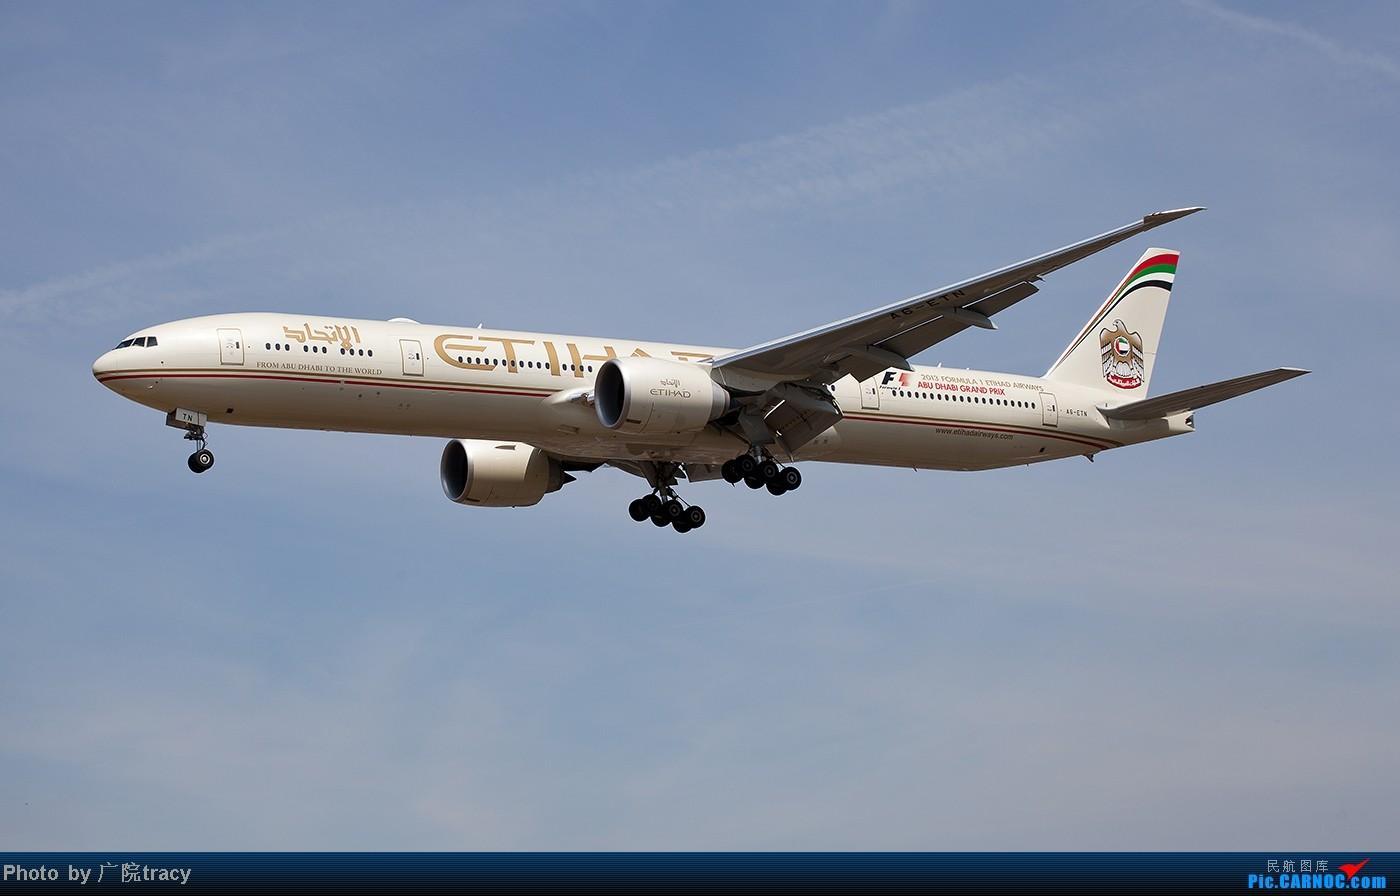 Re:[原创]★ ★ ★ ★ ★中东的航空公司在伦敦希斯罗国际机场  ★ ★ ★ ★ ★ BOEING 777-300ER A6-ETN 英国伦敦希思罗机场